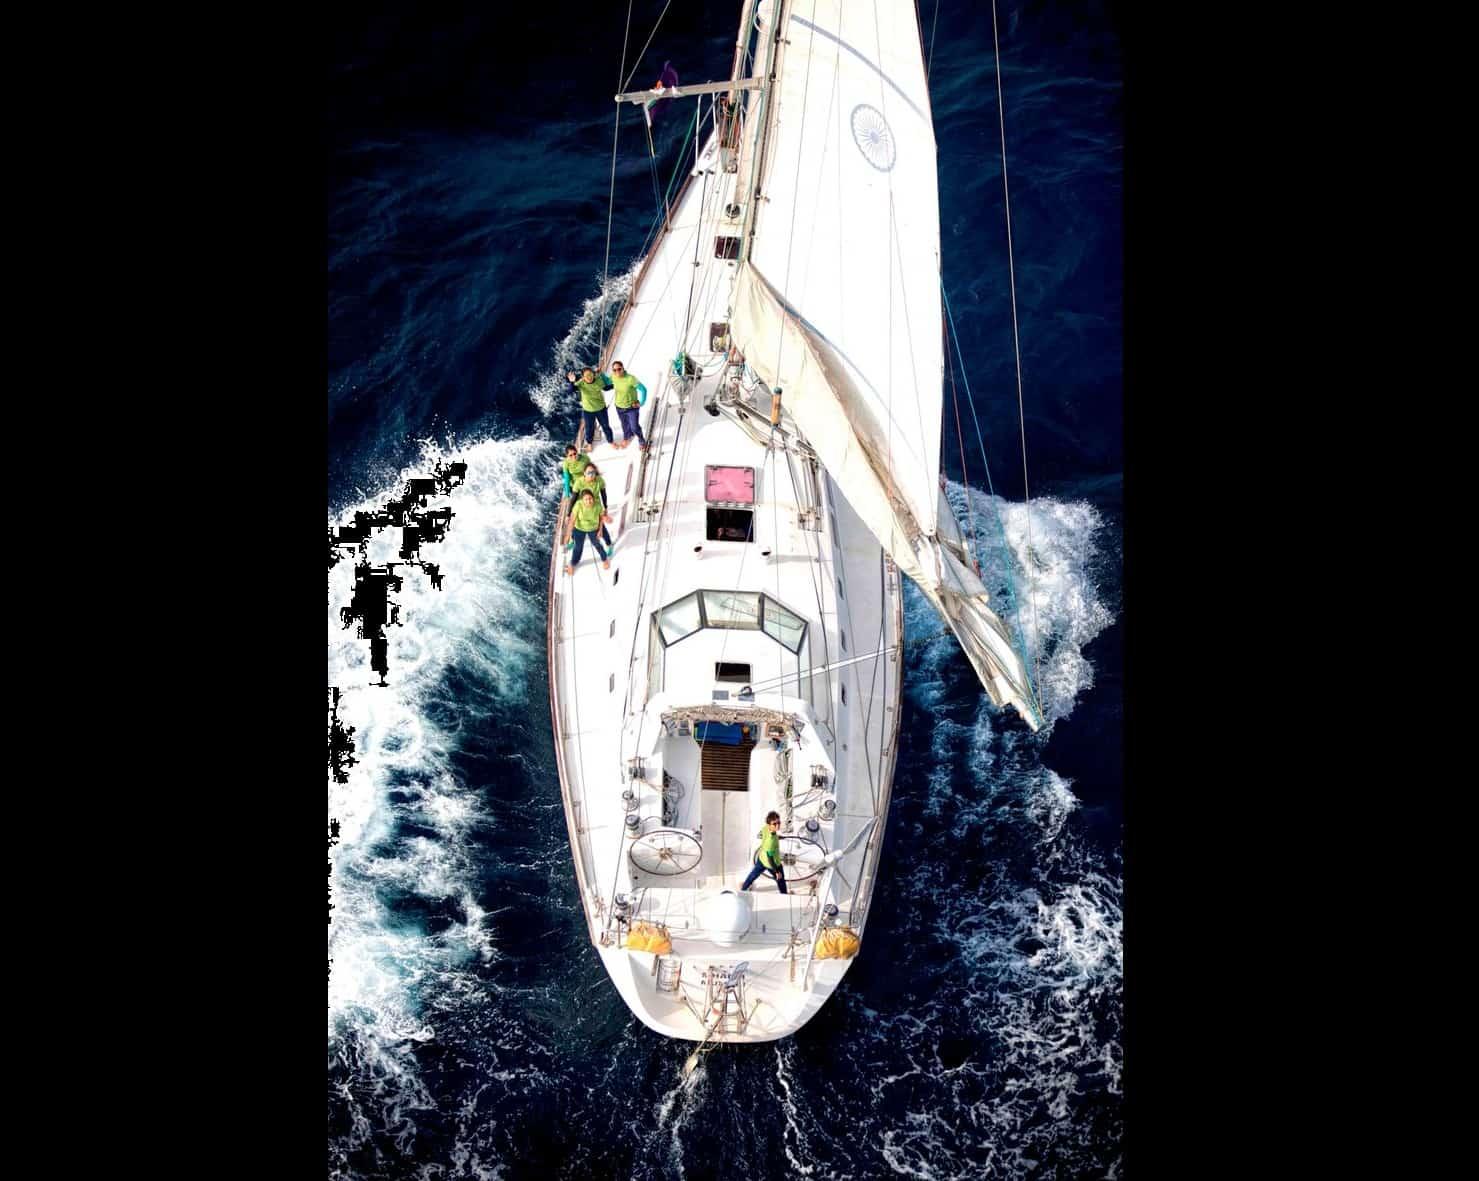 First open-ocean voyage of the Navy's all-women crew. Twitter